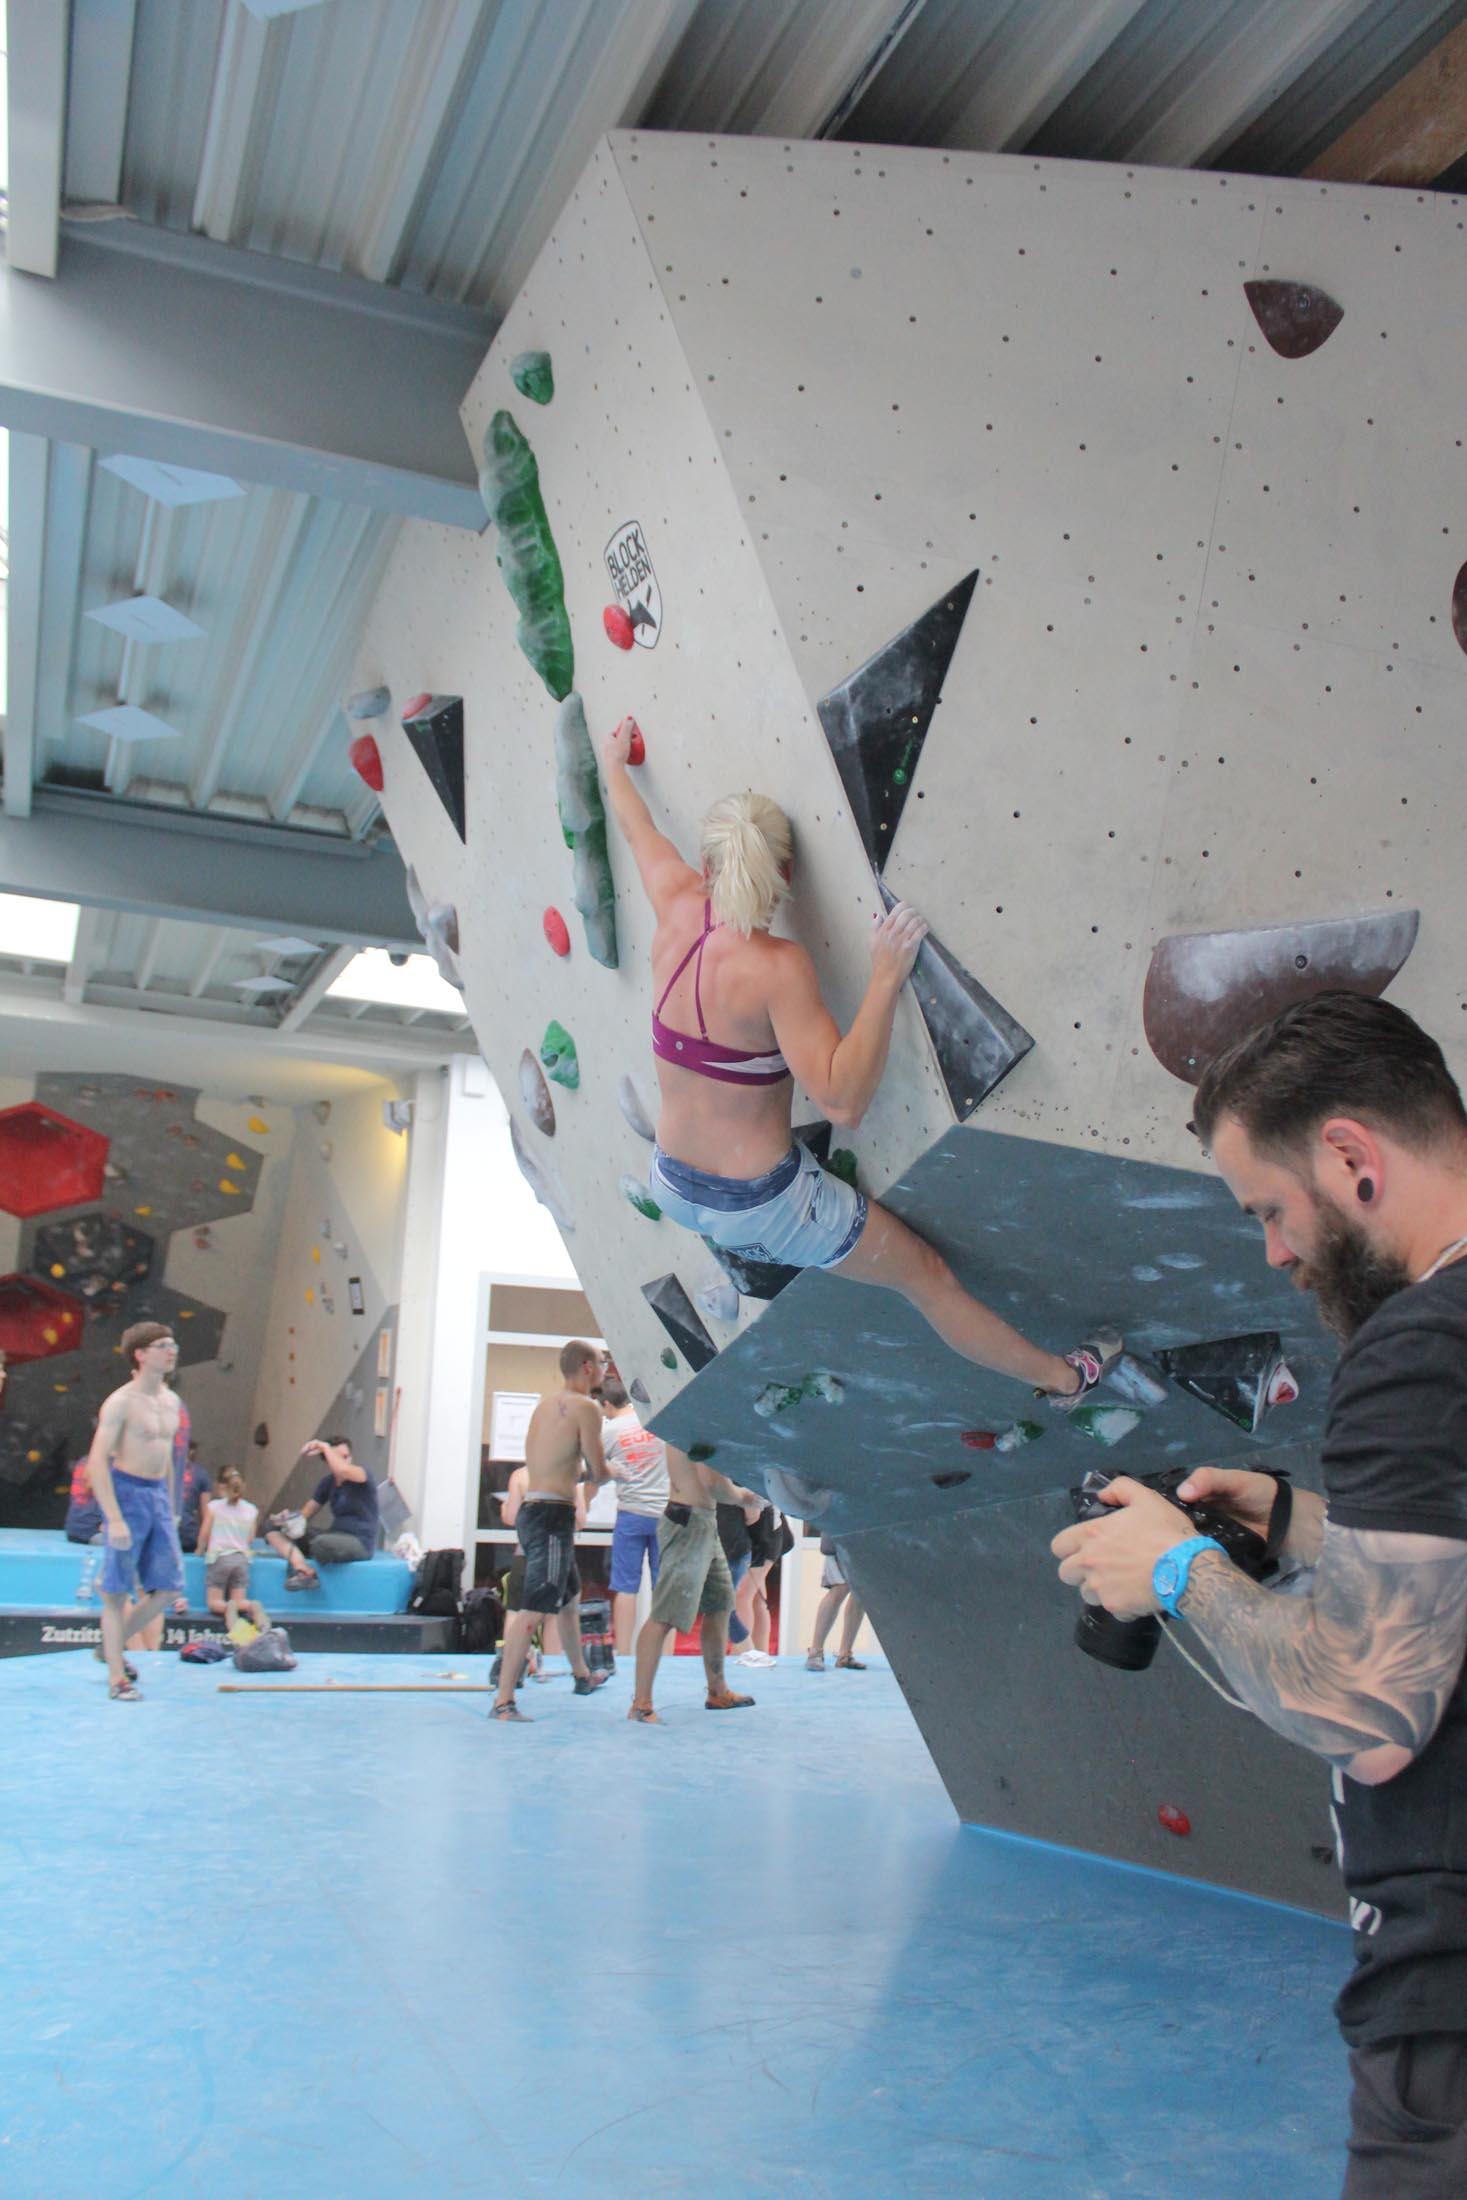 Quali, internationaler bouldercup Frankenjura 2016, BLOCKHELDEN Erlangen, Mammut, Bergfreunde.de, Boulderwettkampf07092016204